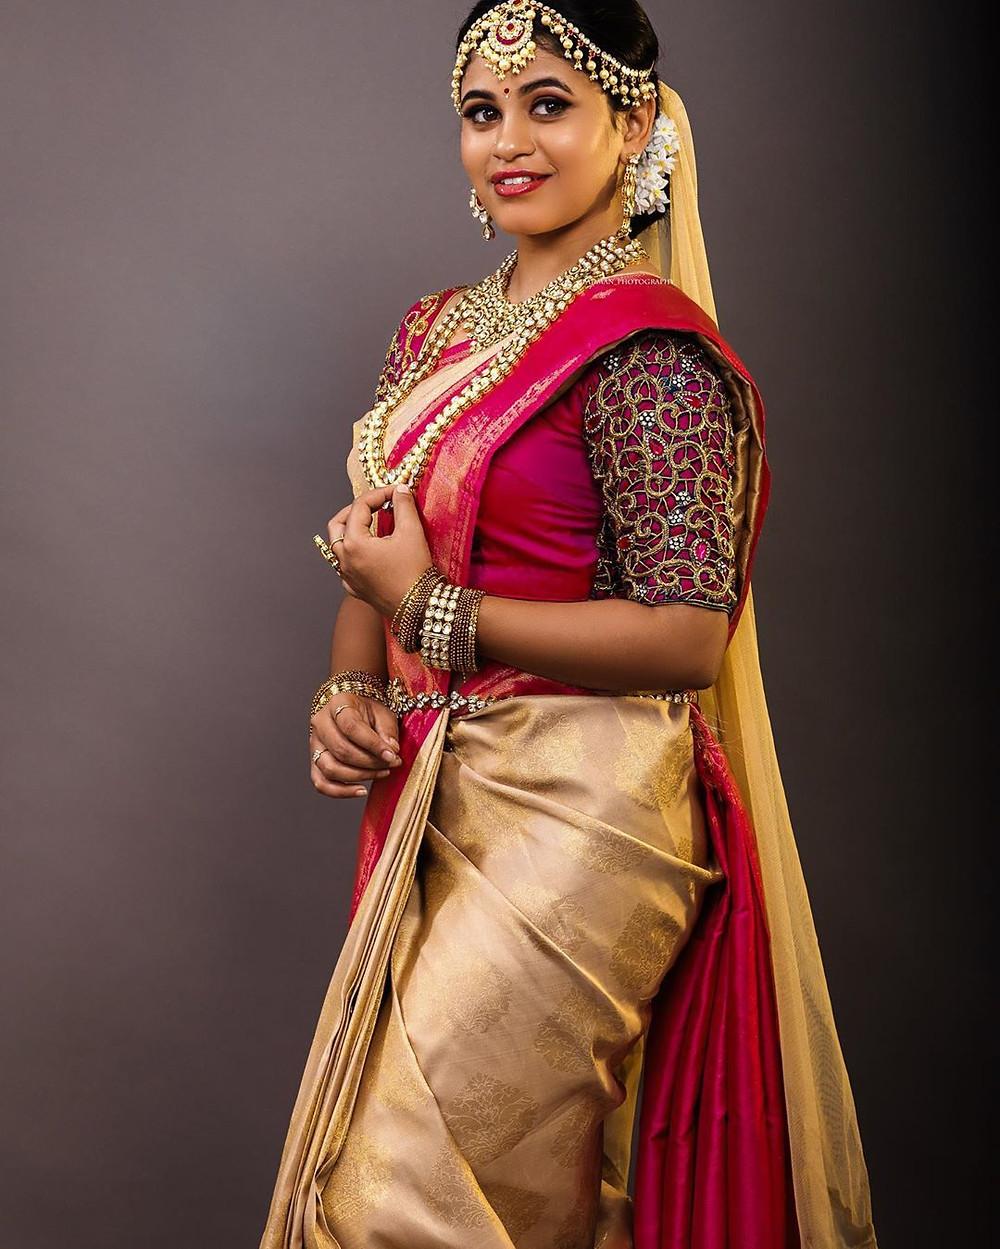 Pujitha Devaraju Wiki